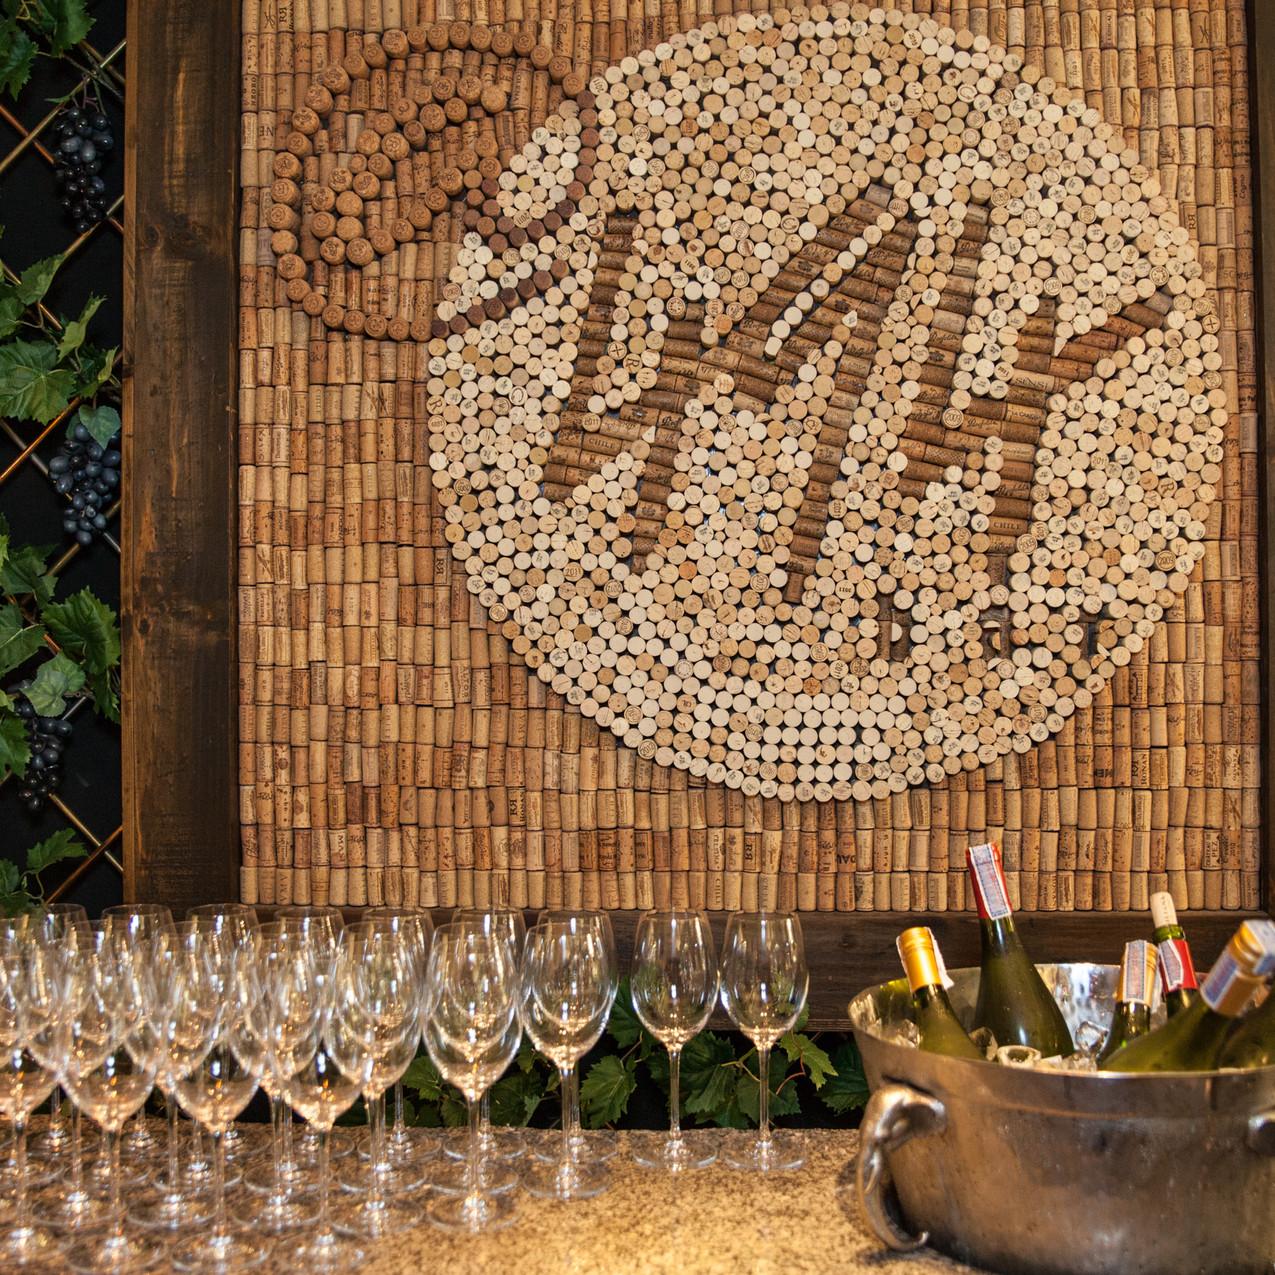 Wine Tasting | thaifoodies.co